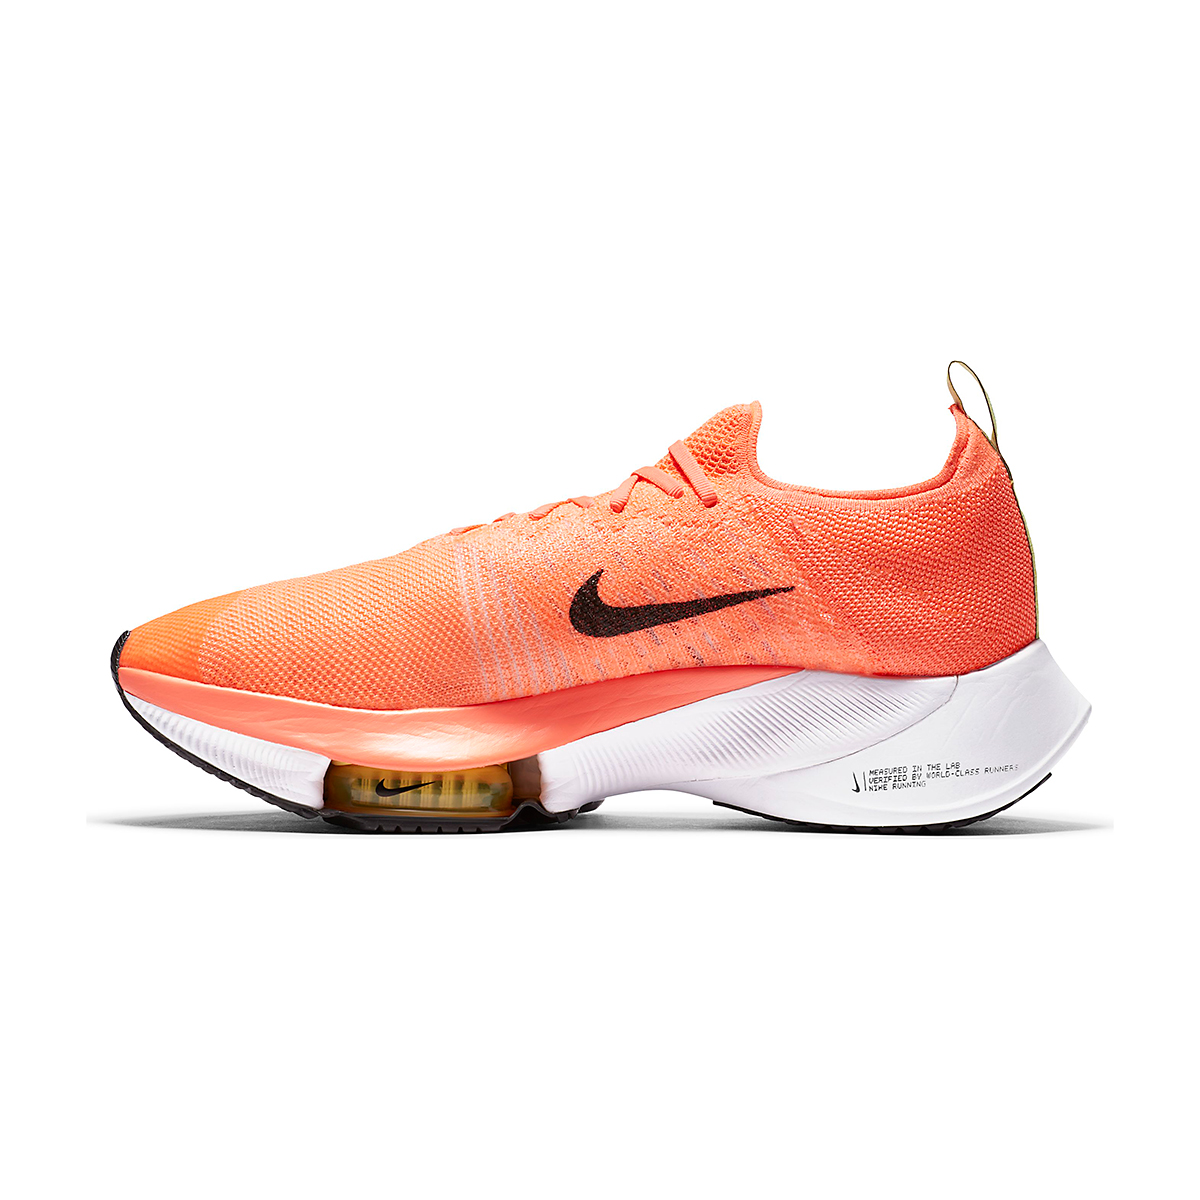 Men's Nike Air Zoom Tempo NEXT% Running Shoe - Color: Bright Mango/Black-Citron Pulse - Size: 6 - Width: Regular, Bright Mango/Black-Citron Pulse, large, image 2